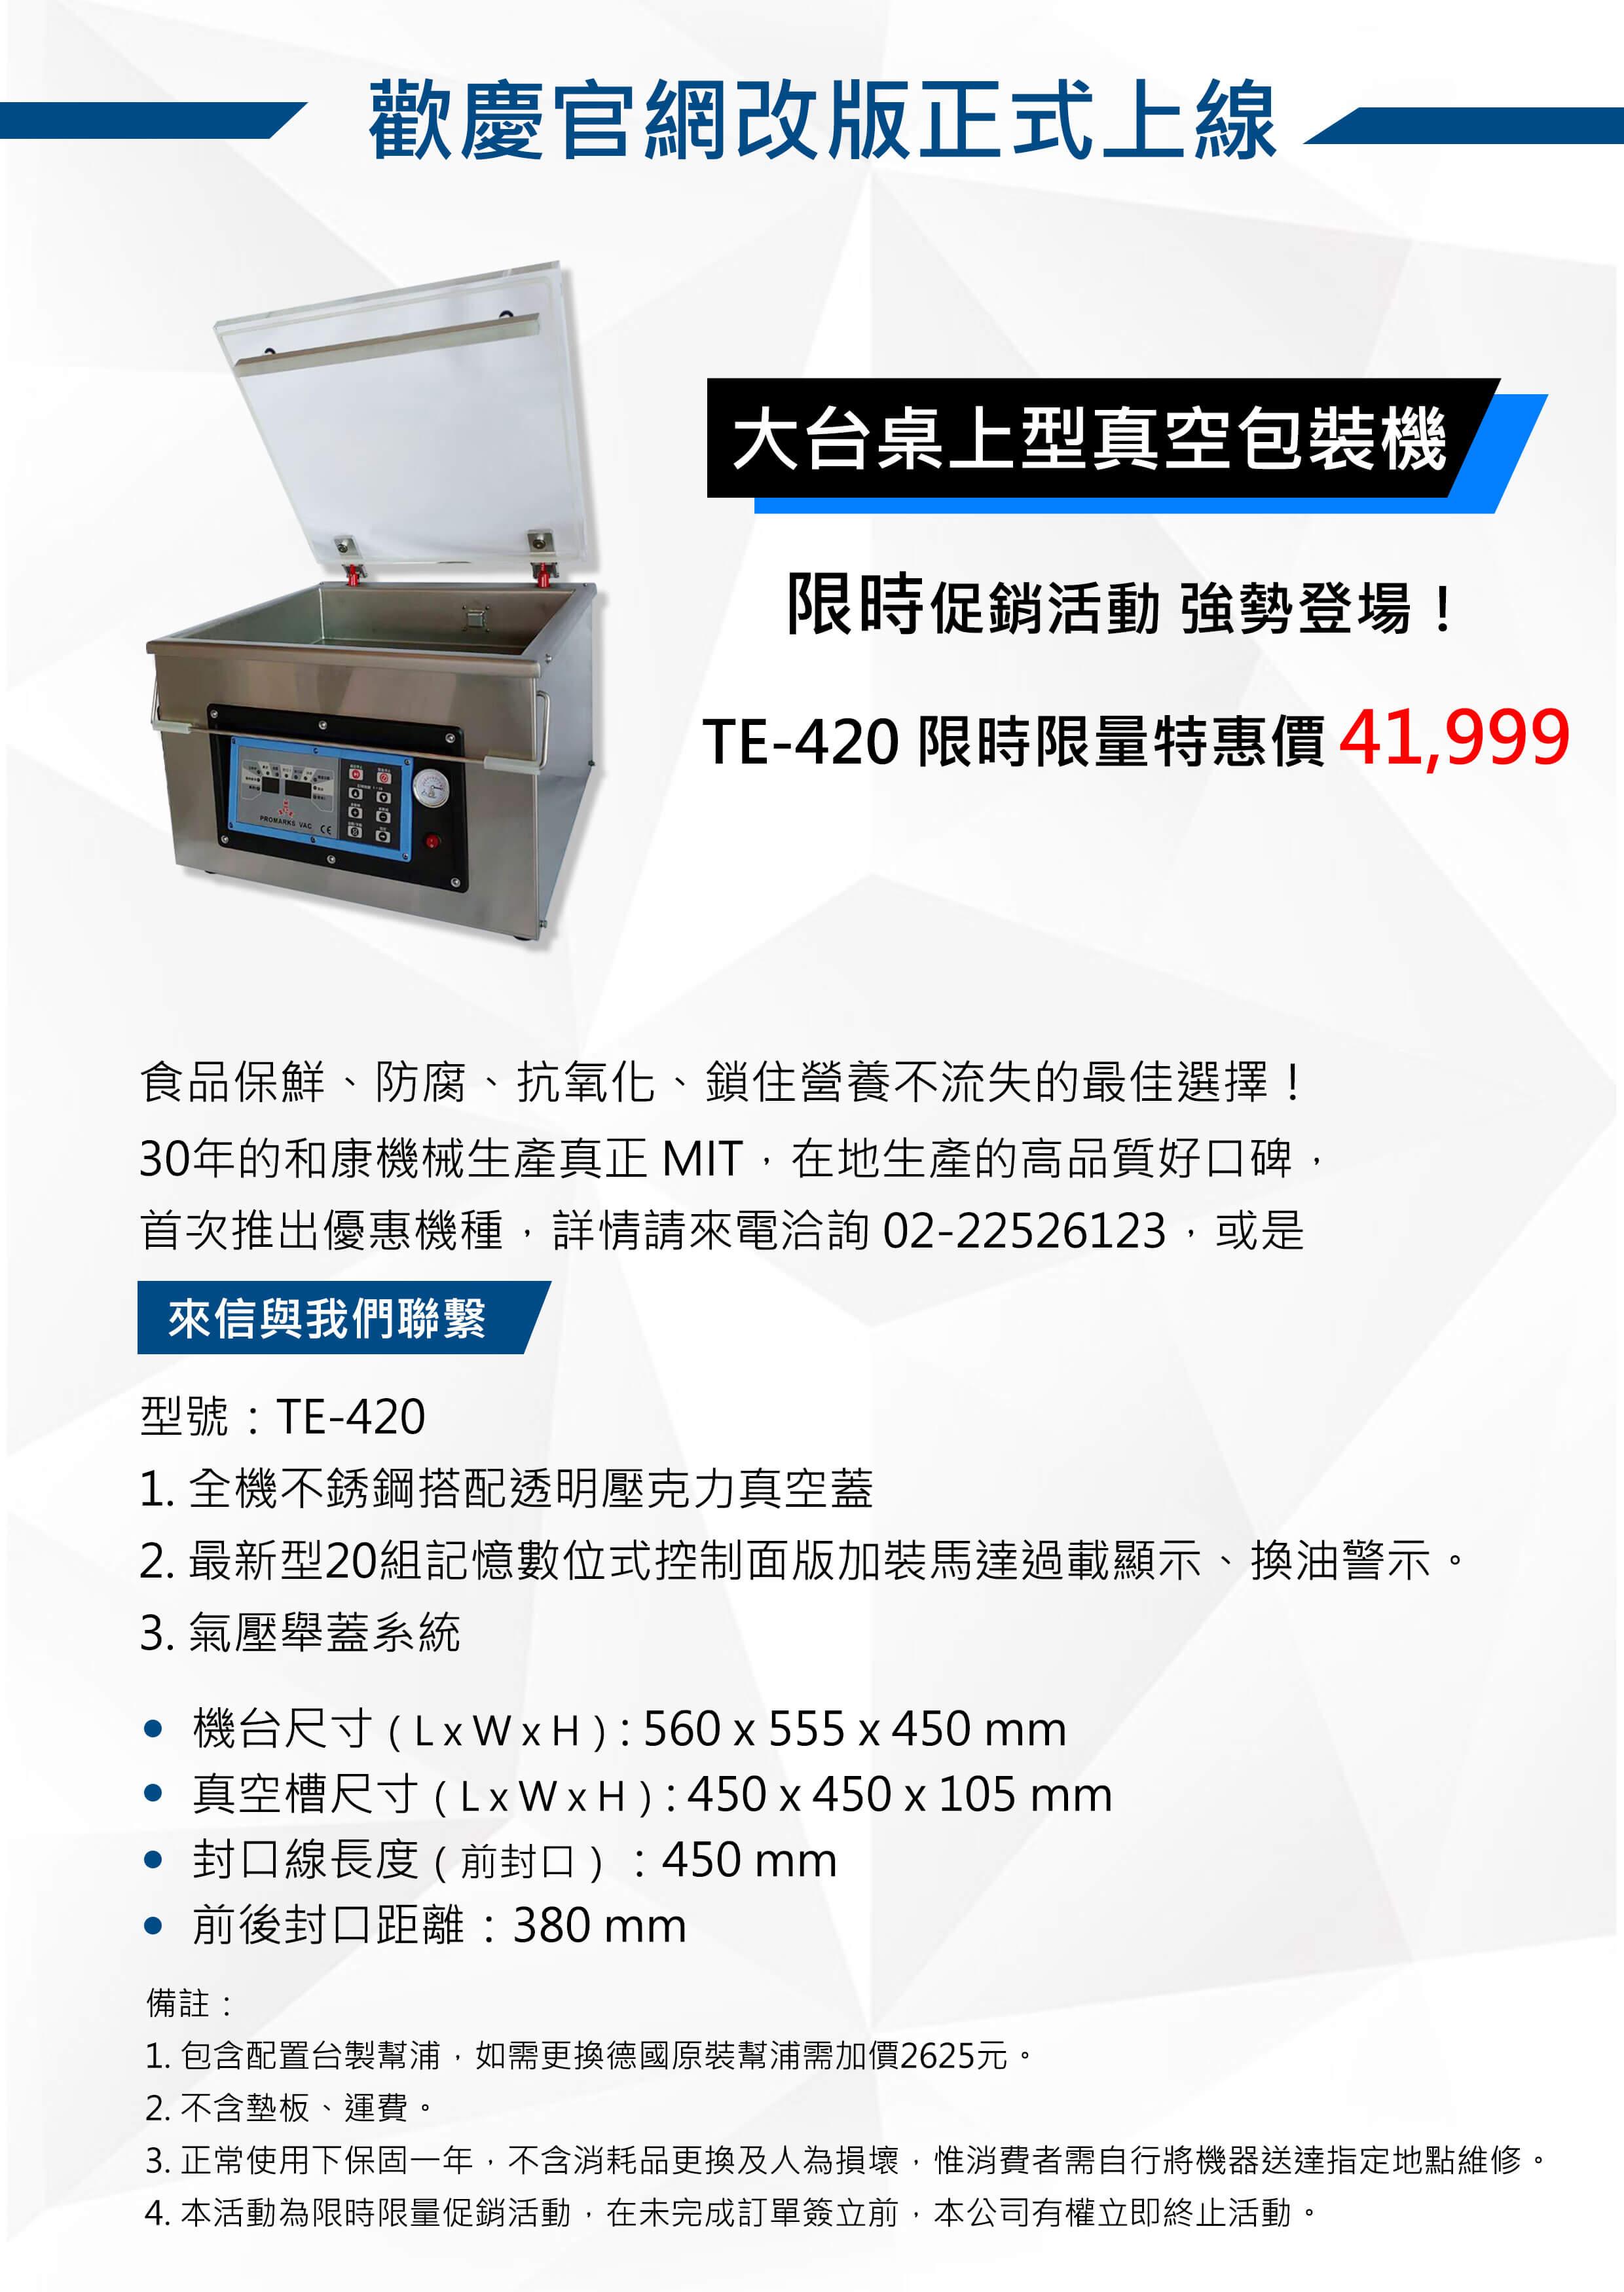 TE-420 限時限量特惠價 39999